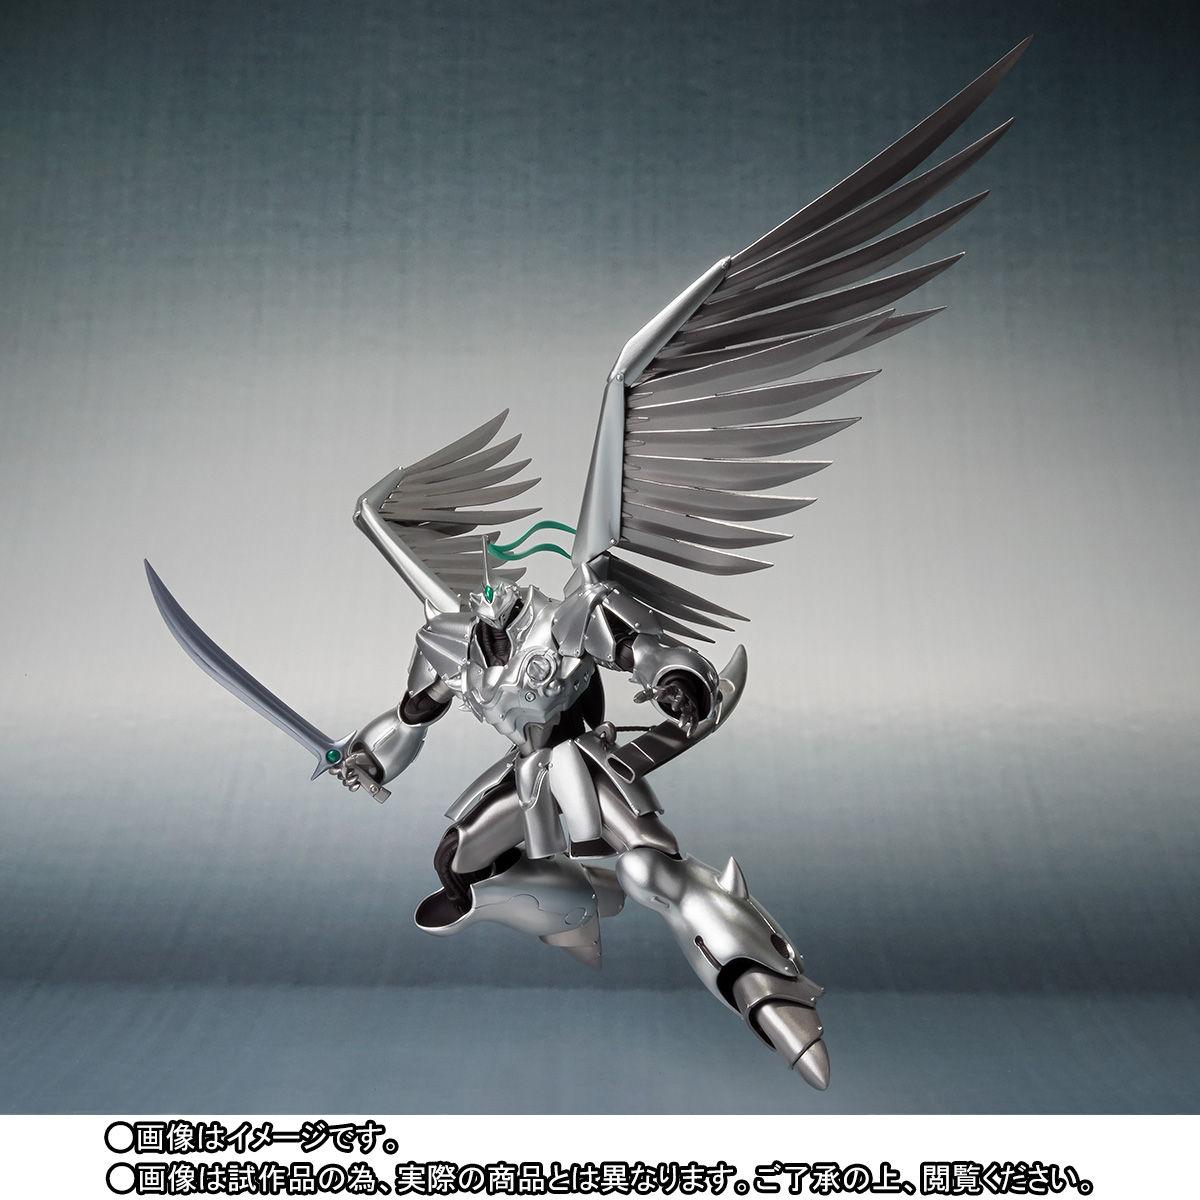 ROBOT魂〈SIDE PB〉『飛甲兵』機甲界ガリアン 鉄の紋章 可動フィギュア-007